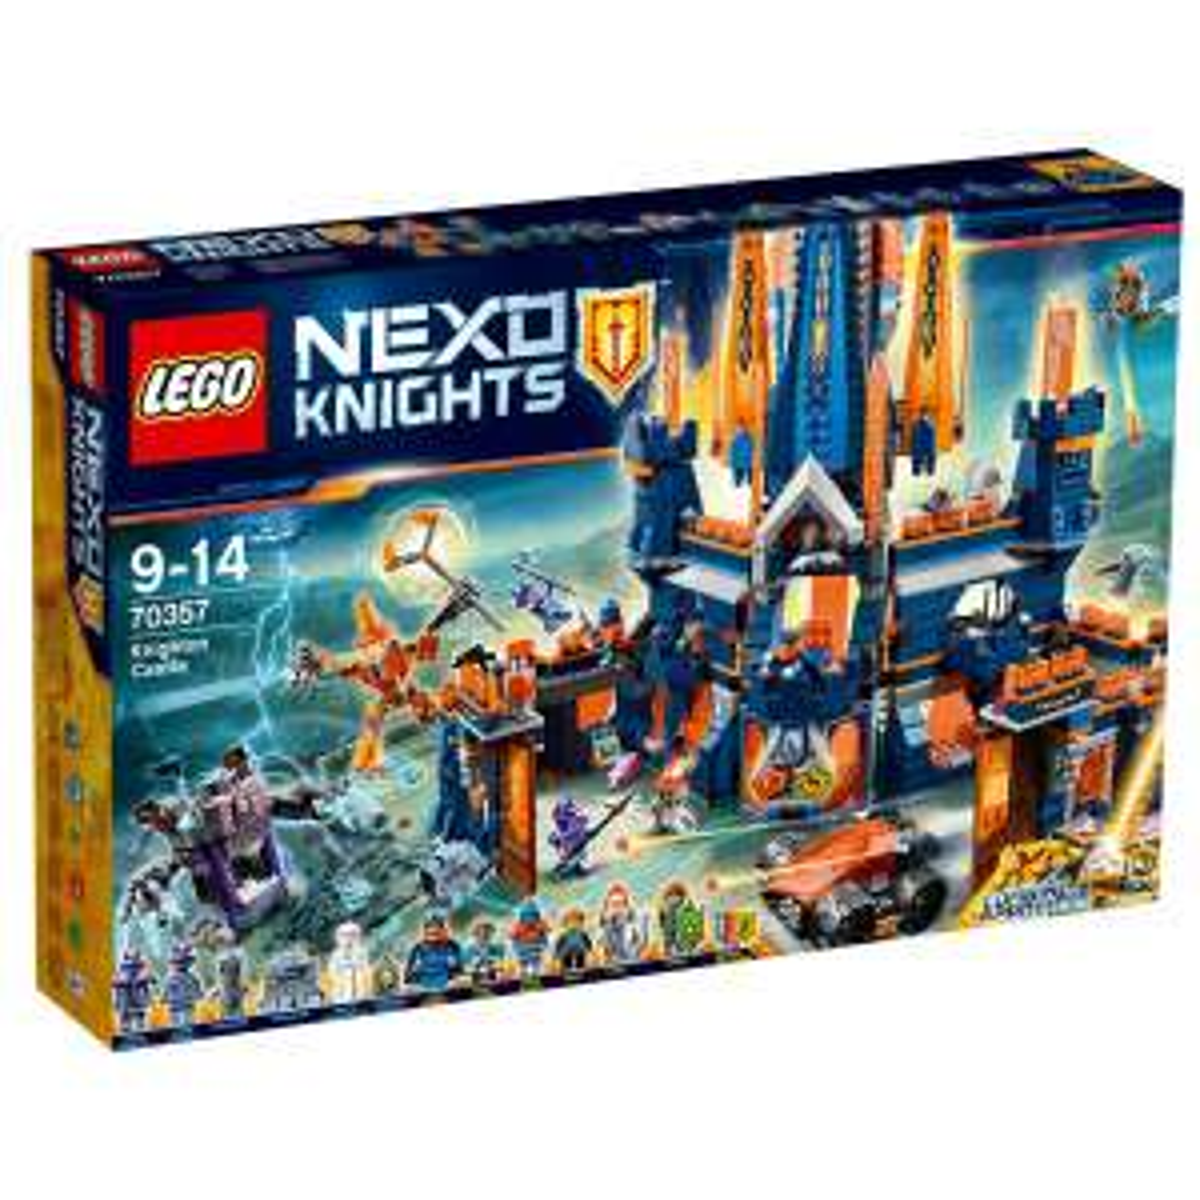 LEGO Nexo Knights - Schloss Knighton & Ninjago Flugsegler für jeweils 80€ (Abholung Karstadt)